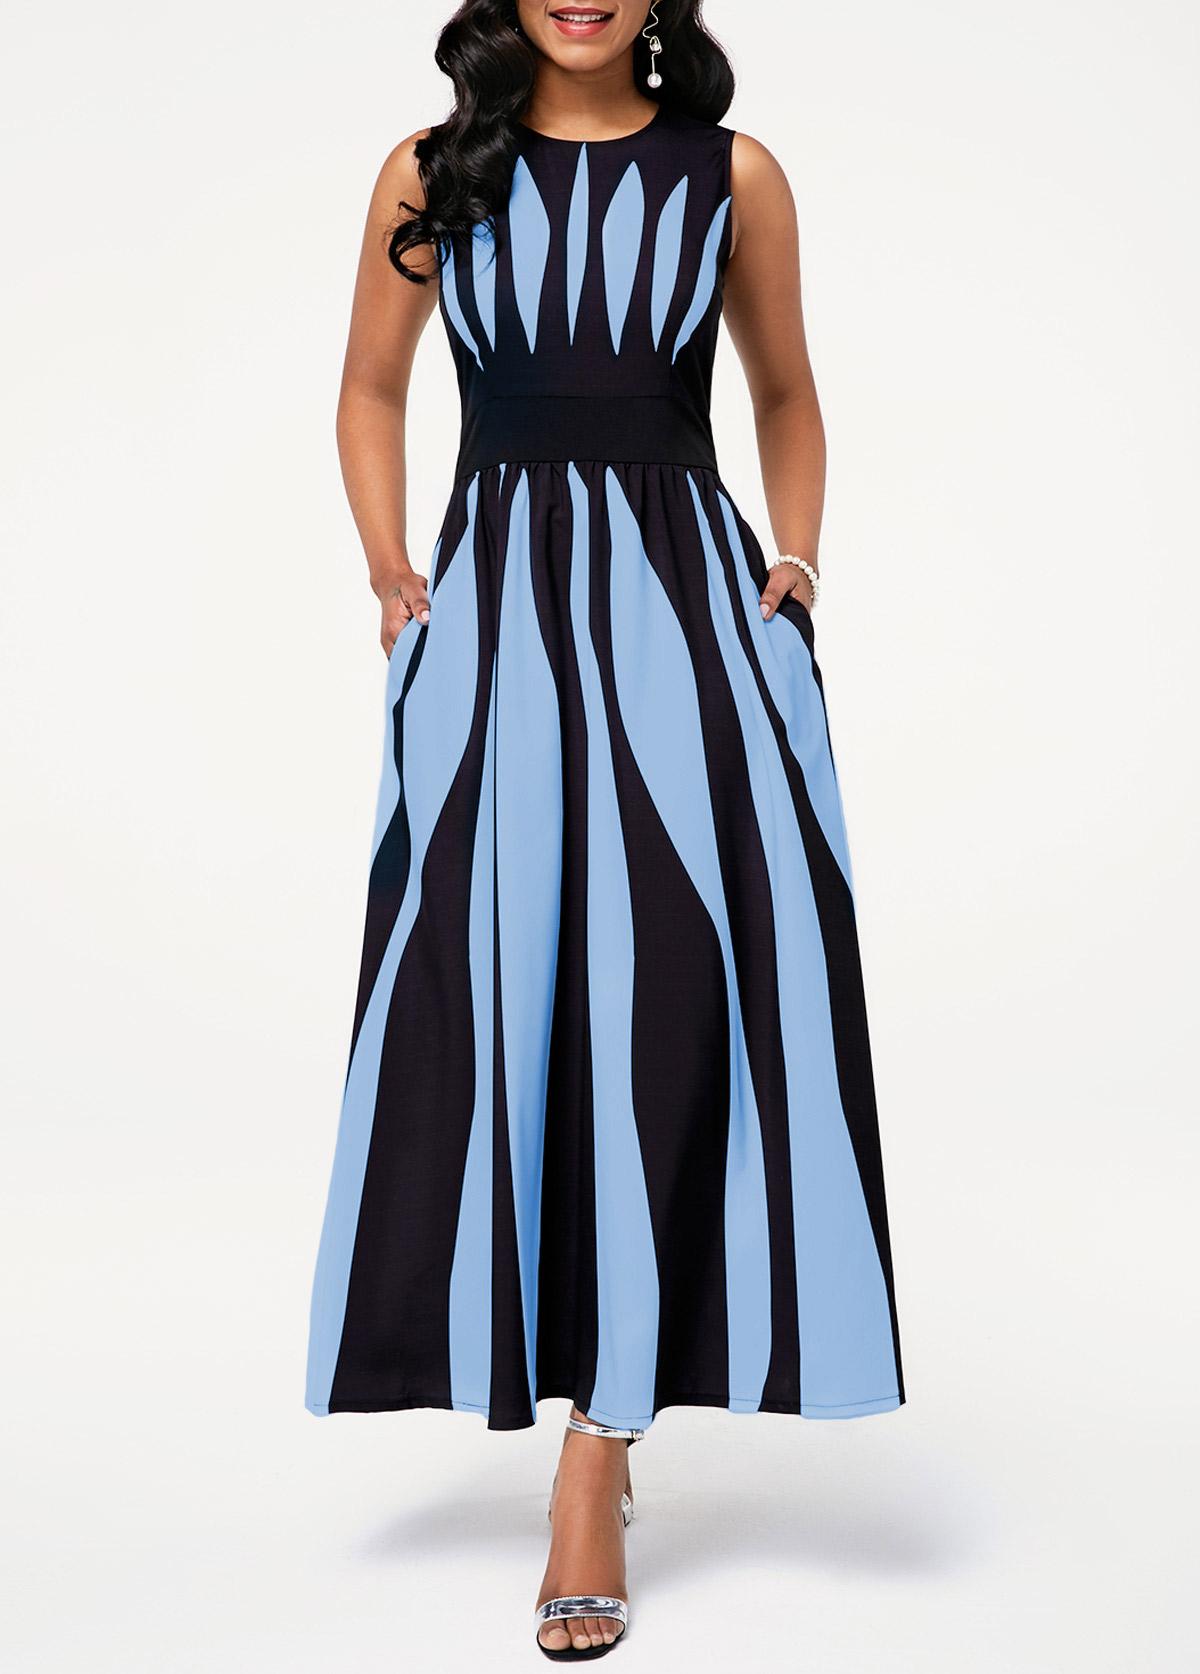 High Waist Sleeveless Stripe Print Pocket Dress